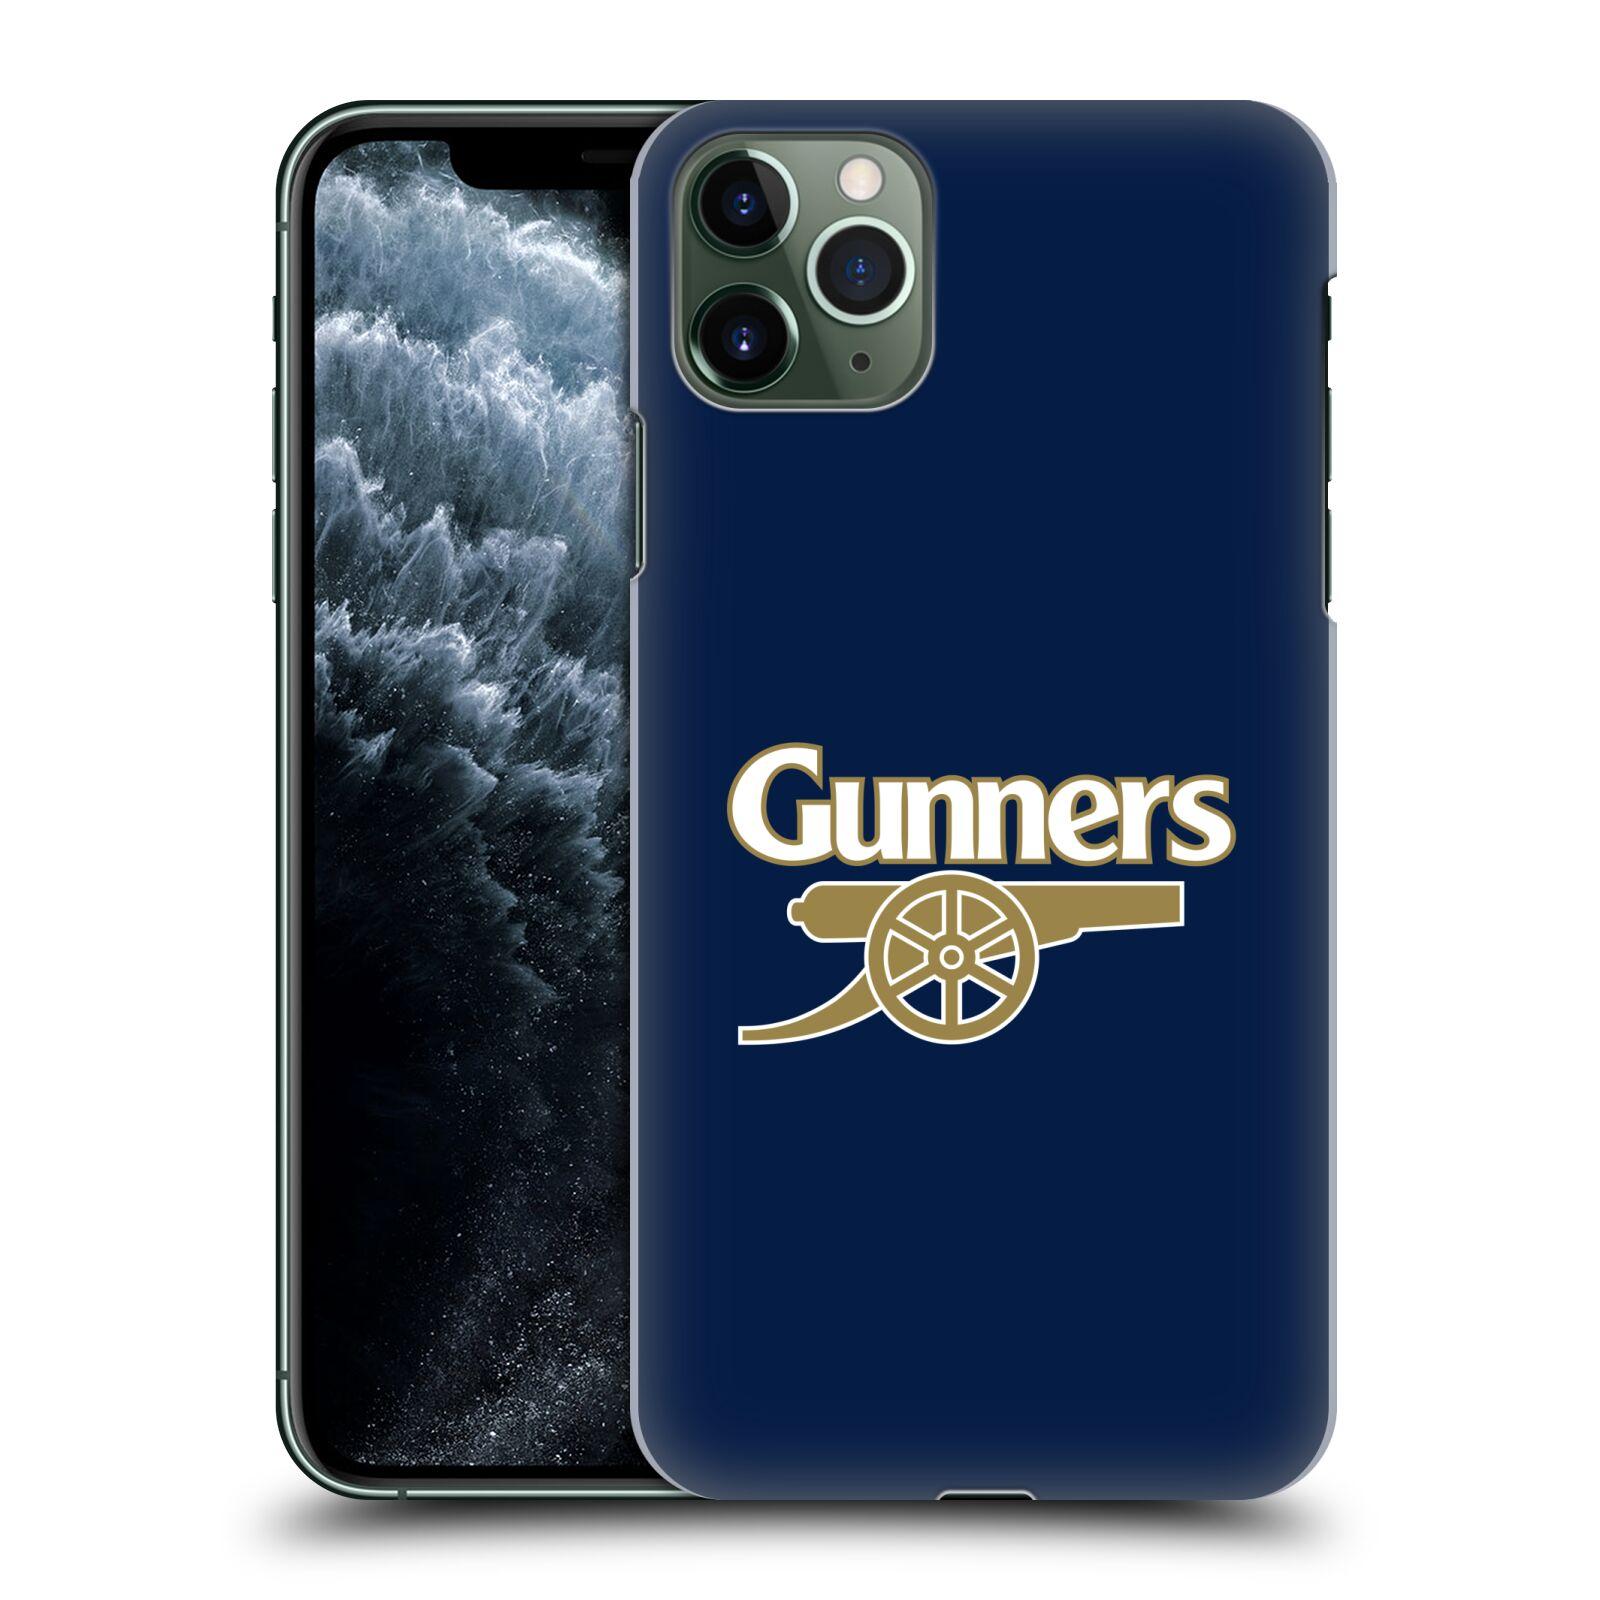 Plastové pouzdro na mobil Apple iPhone 11 Pro Max - Head Case - Arsenal FC - Gunners